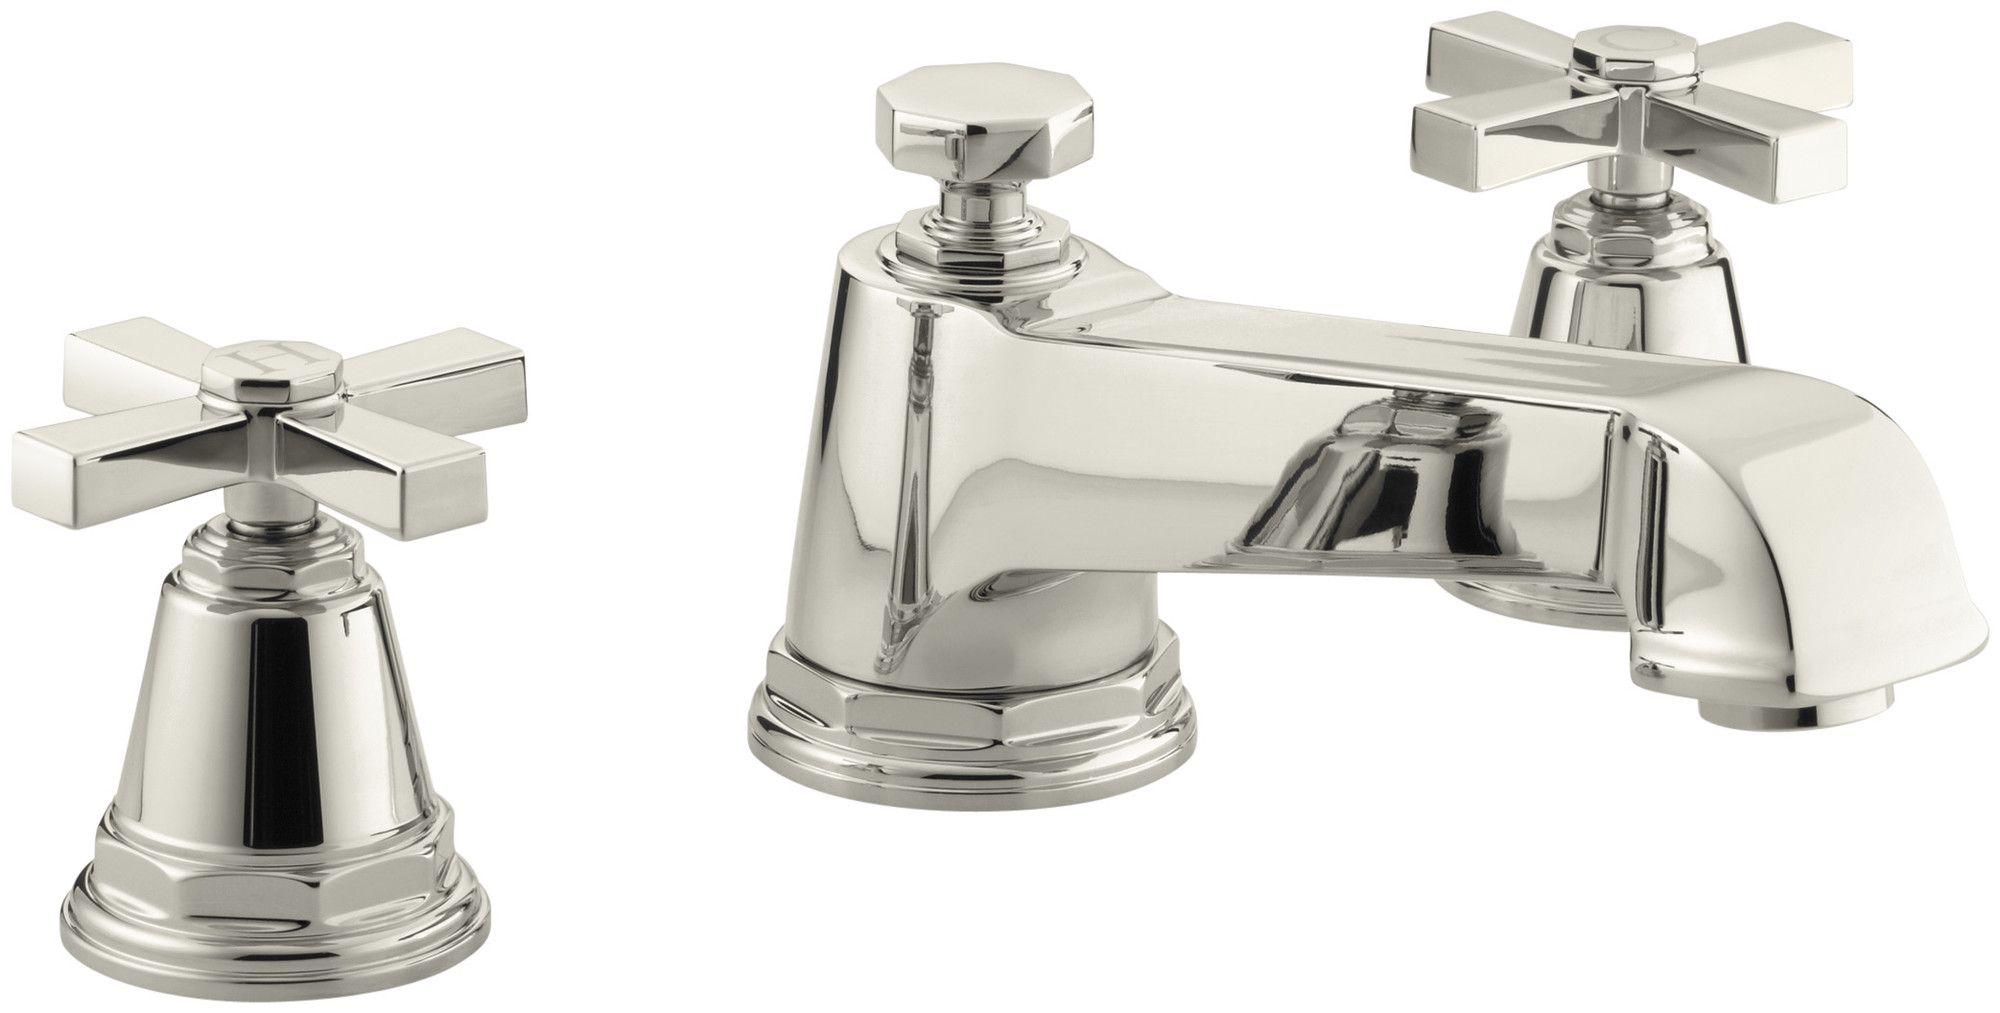 Pinstripe Pure Deck Mount Bath Faucet Trim For High Flow Valve With Cross Handles